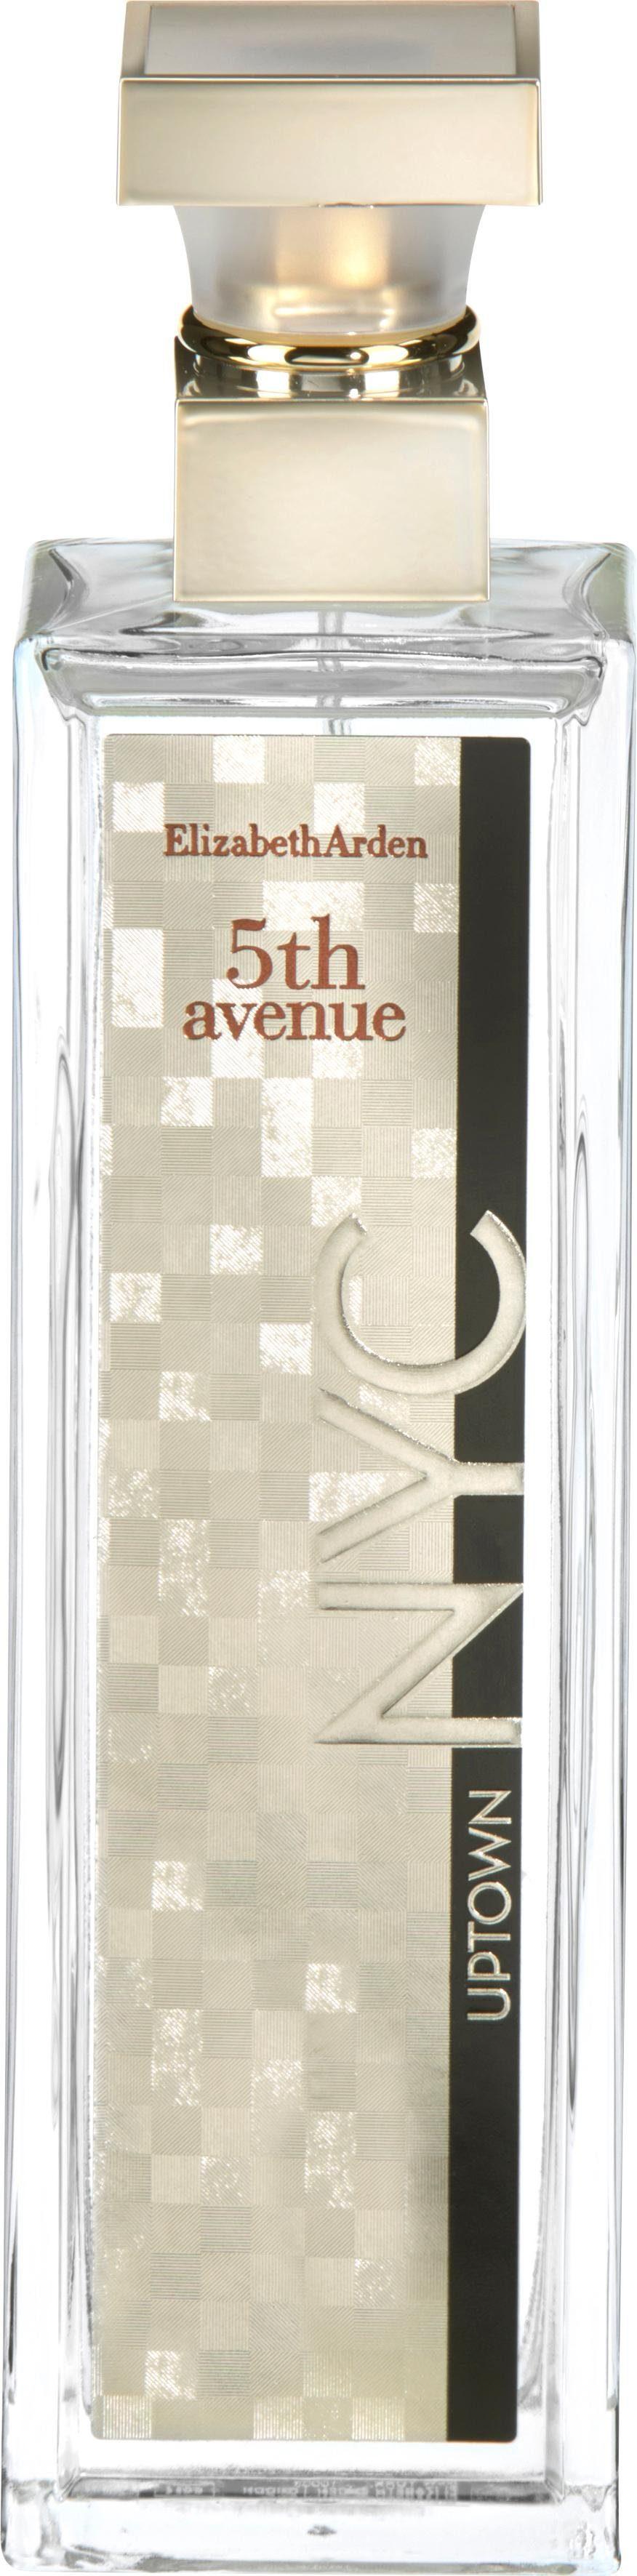 Elizabeth Arden, »5th Avenue Uptown NYC«, Eau de Parfum